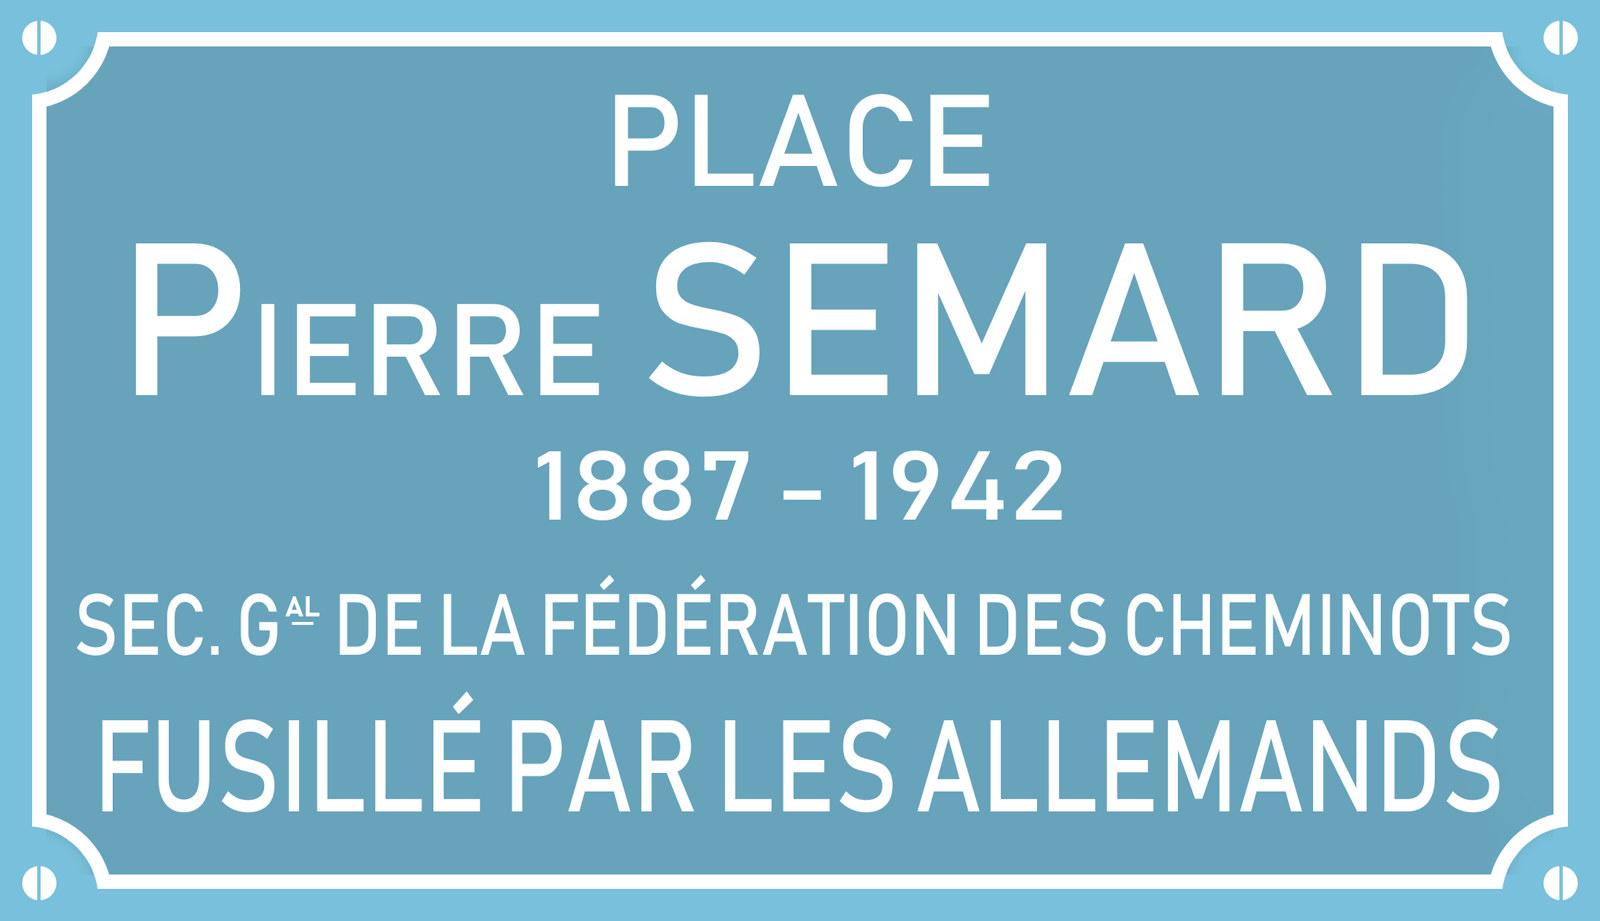 Place Pierre Semard, Tourcoing - Gare de Tourcoing